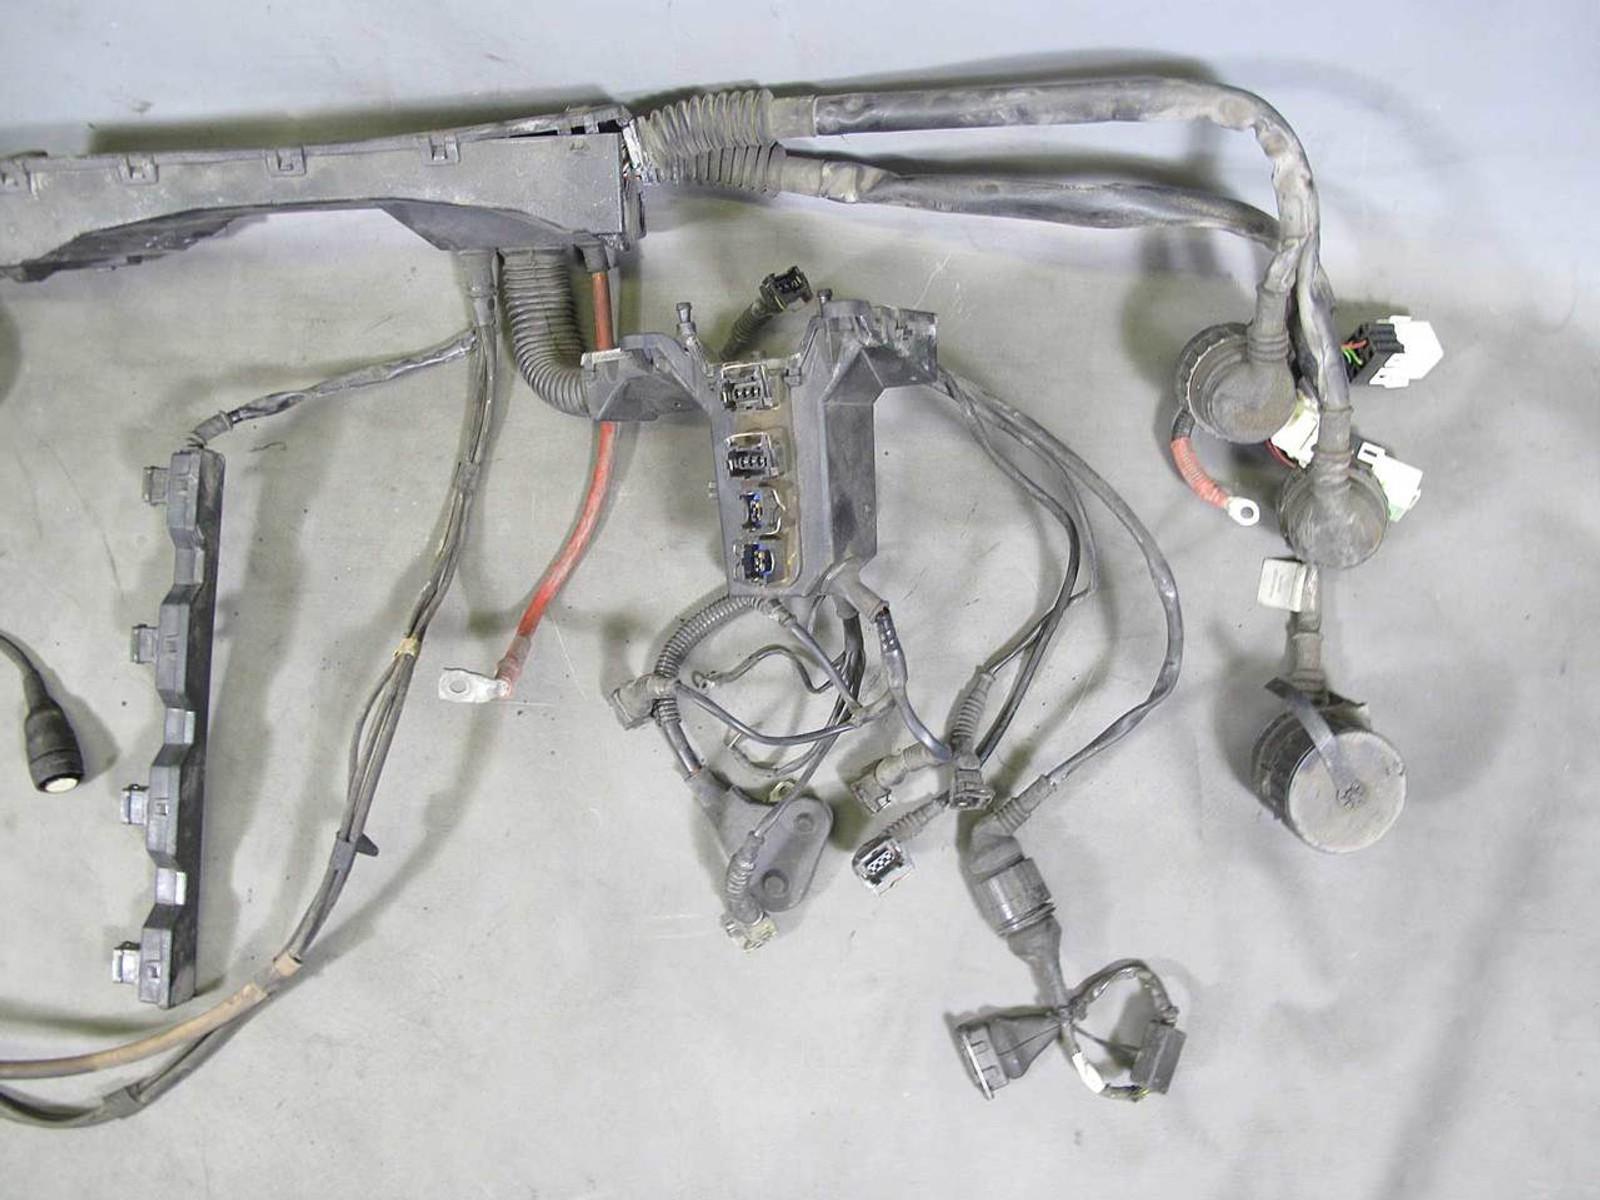 medium resolution of 1995 bmw wiring harness wiring diagram info 1995 bmw wiring harness